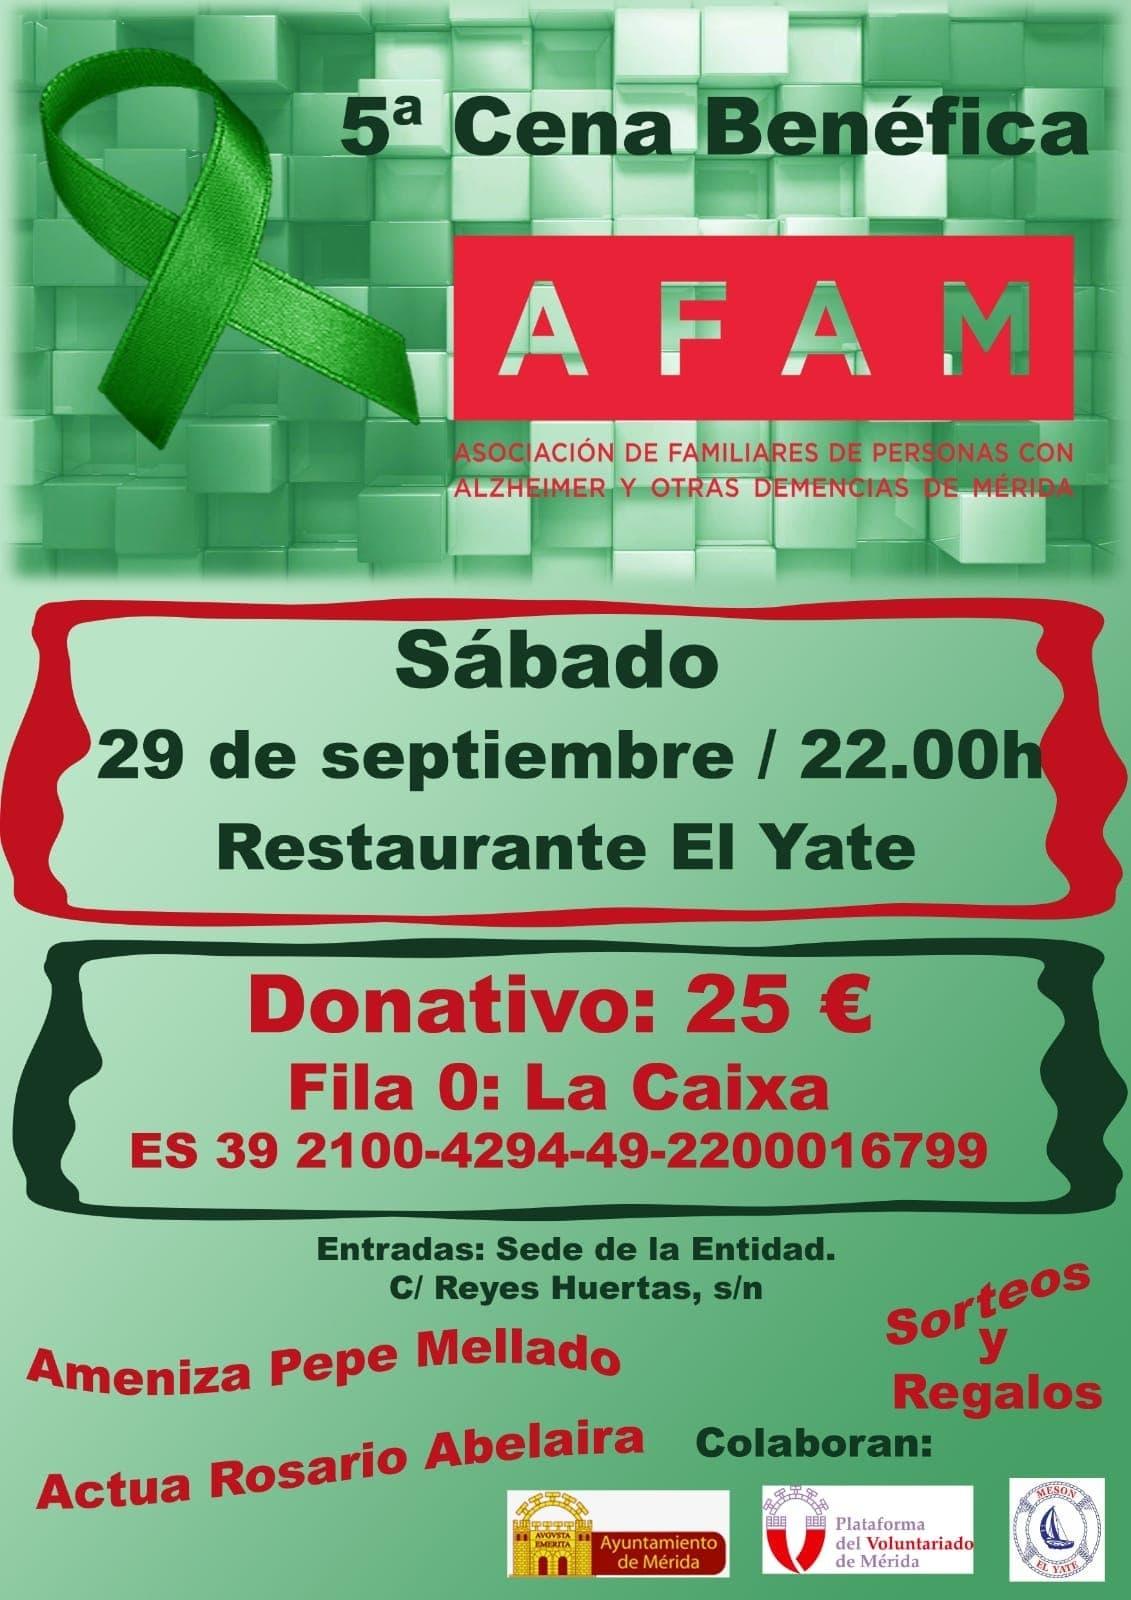 5ª Cena Benéfica en favor de AFAM